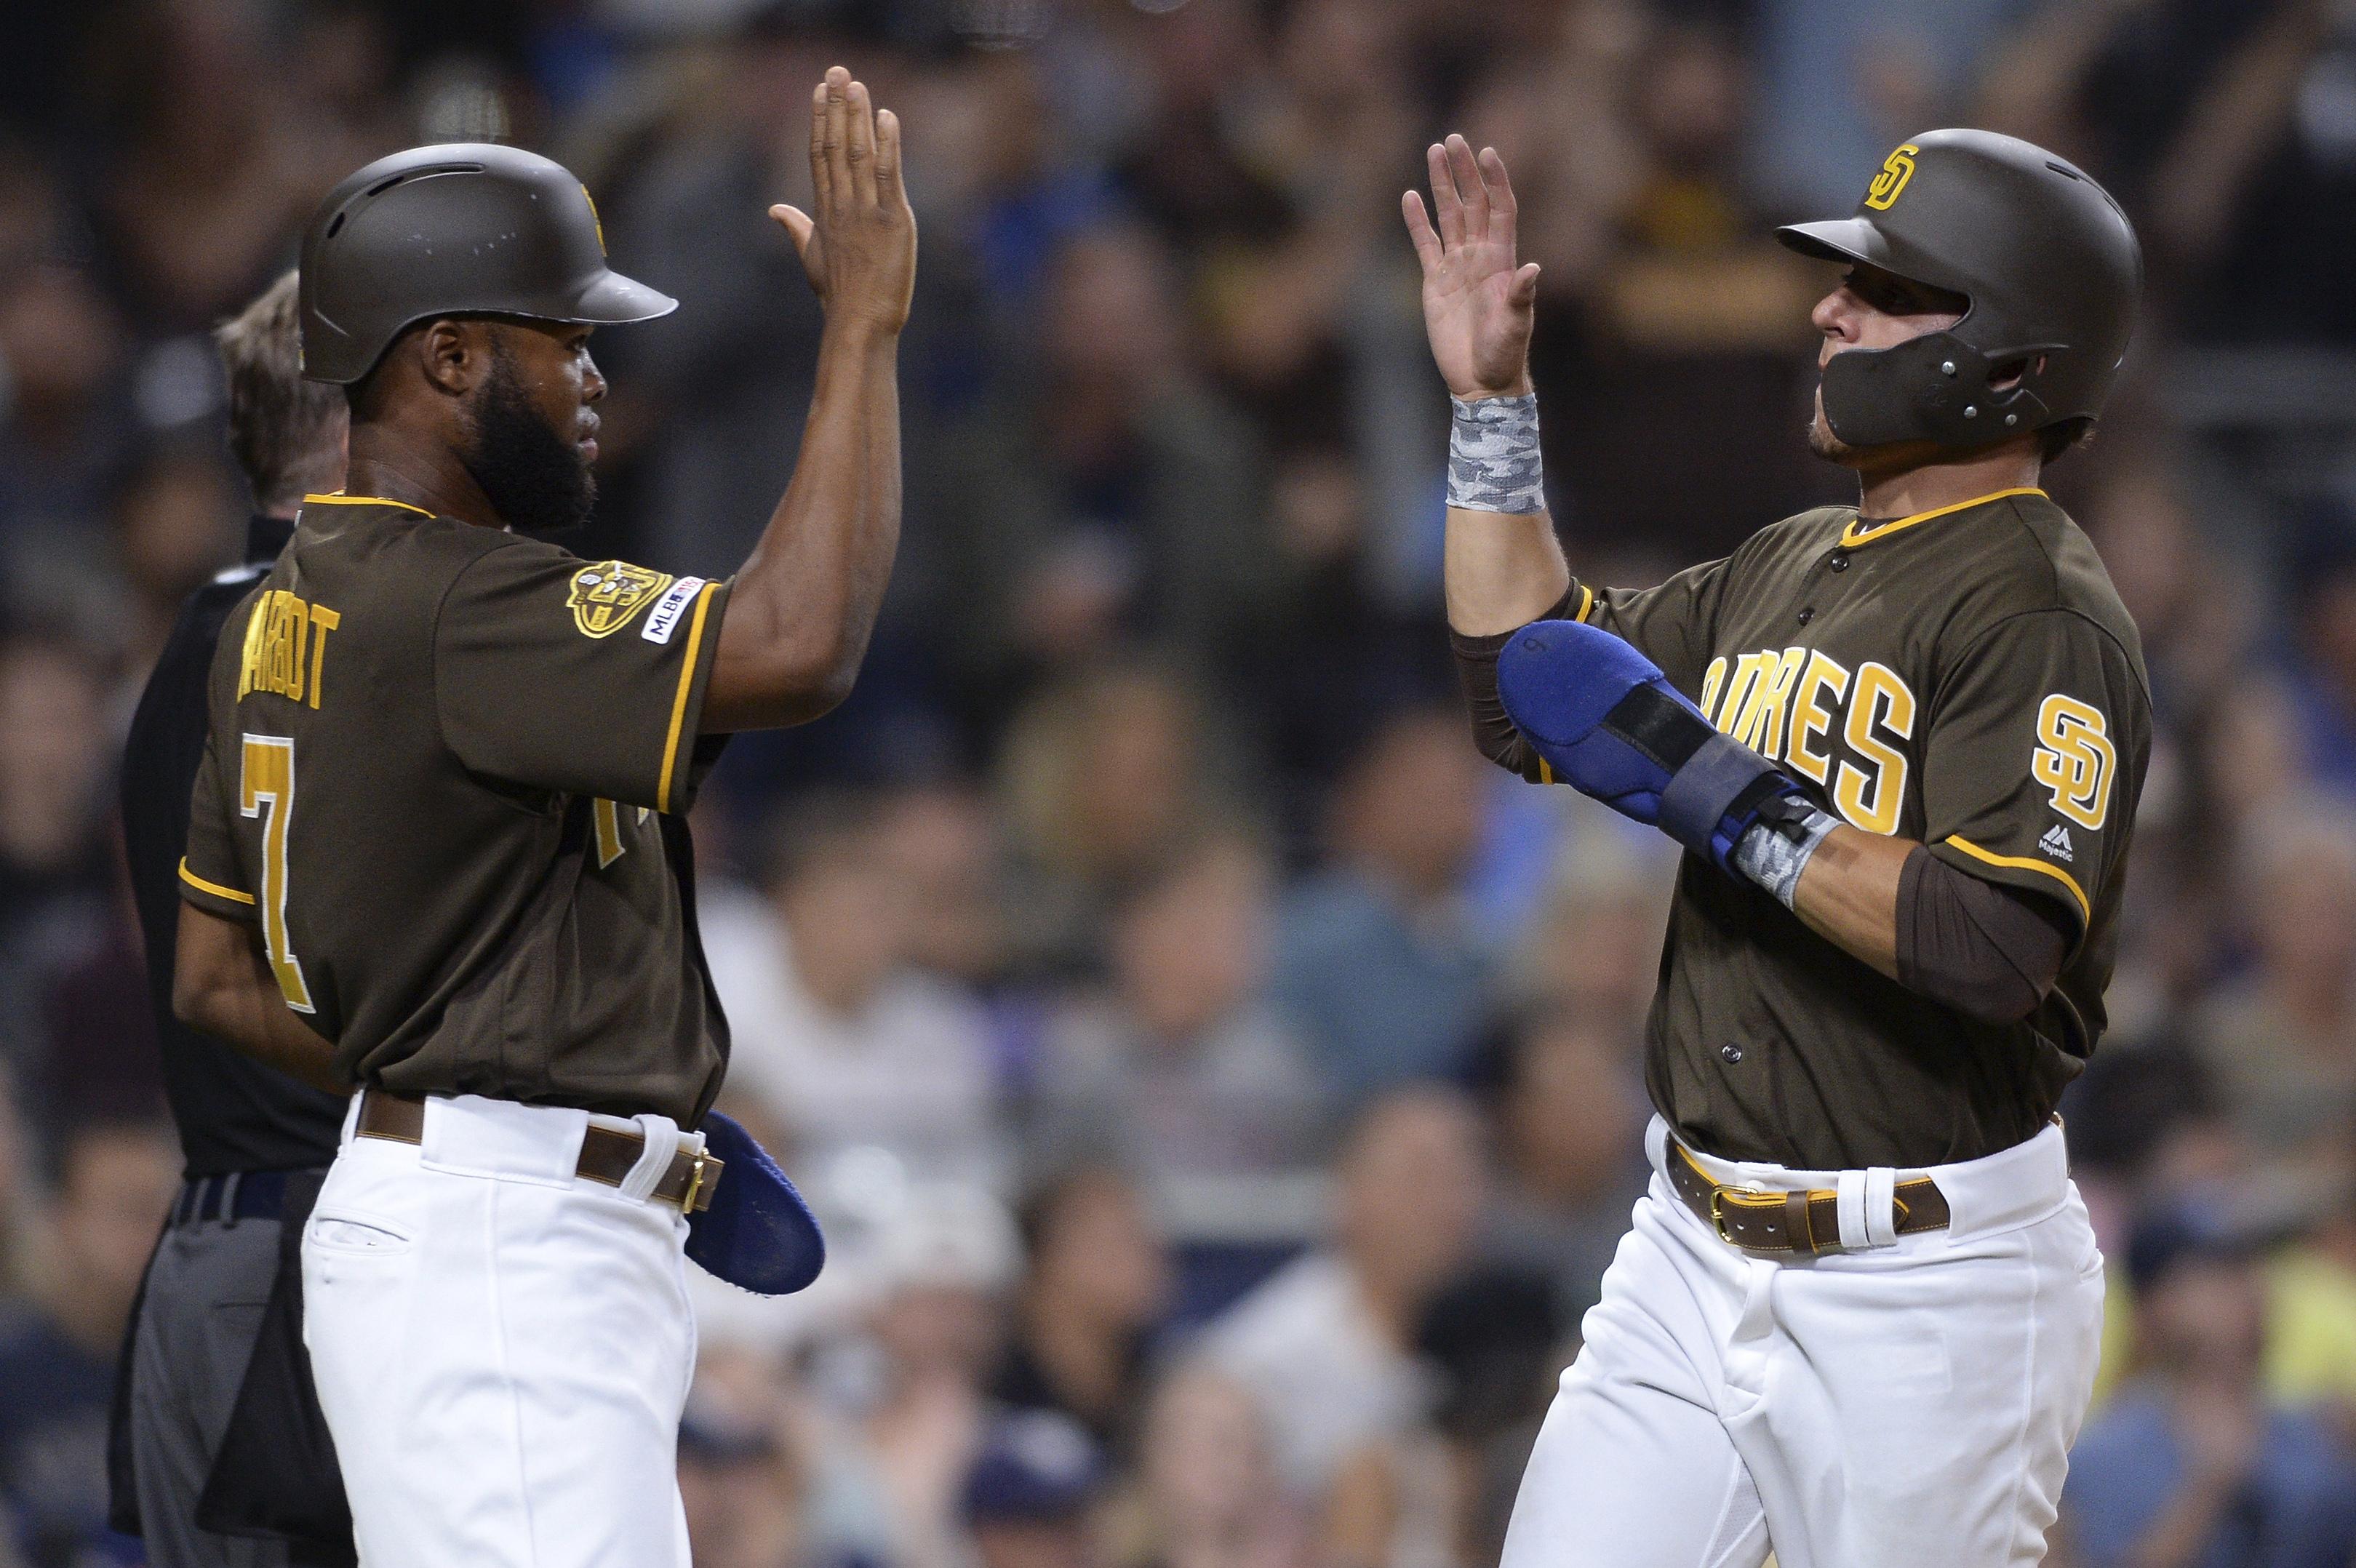 Rookies Tatis Jr., Quantrill lead Padres over Rockies 7-1